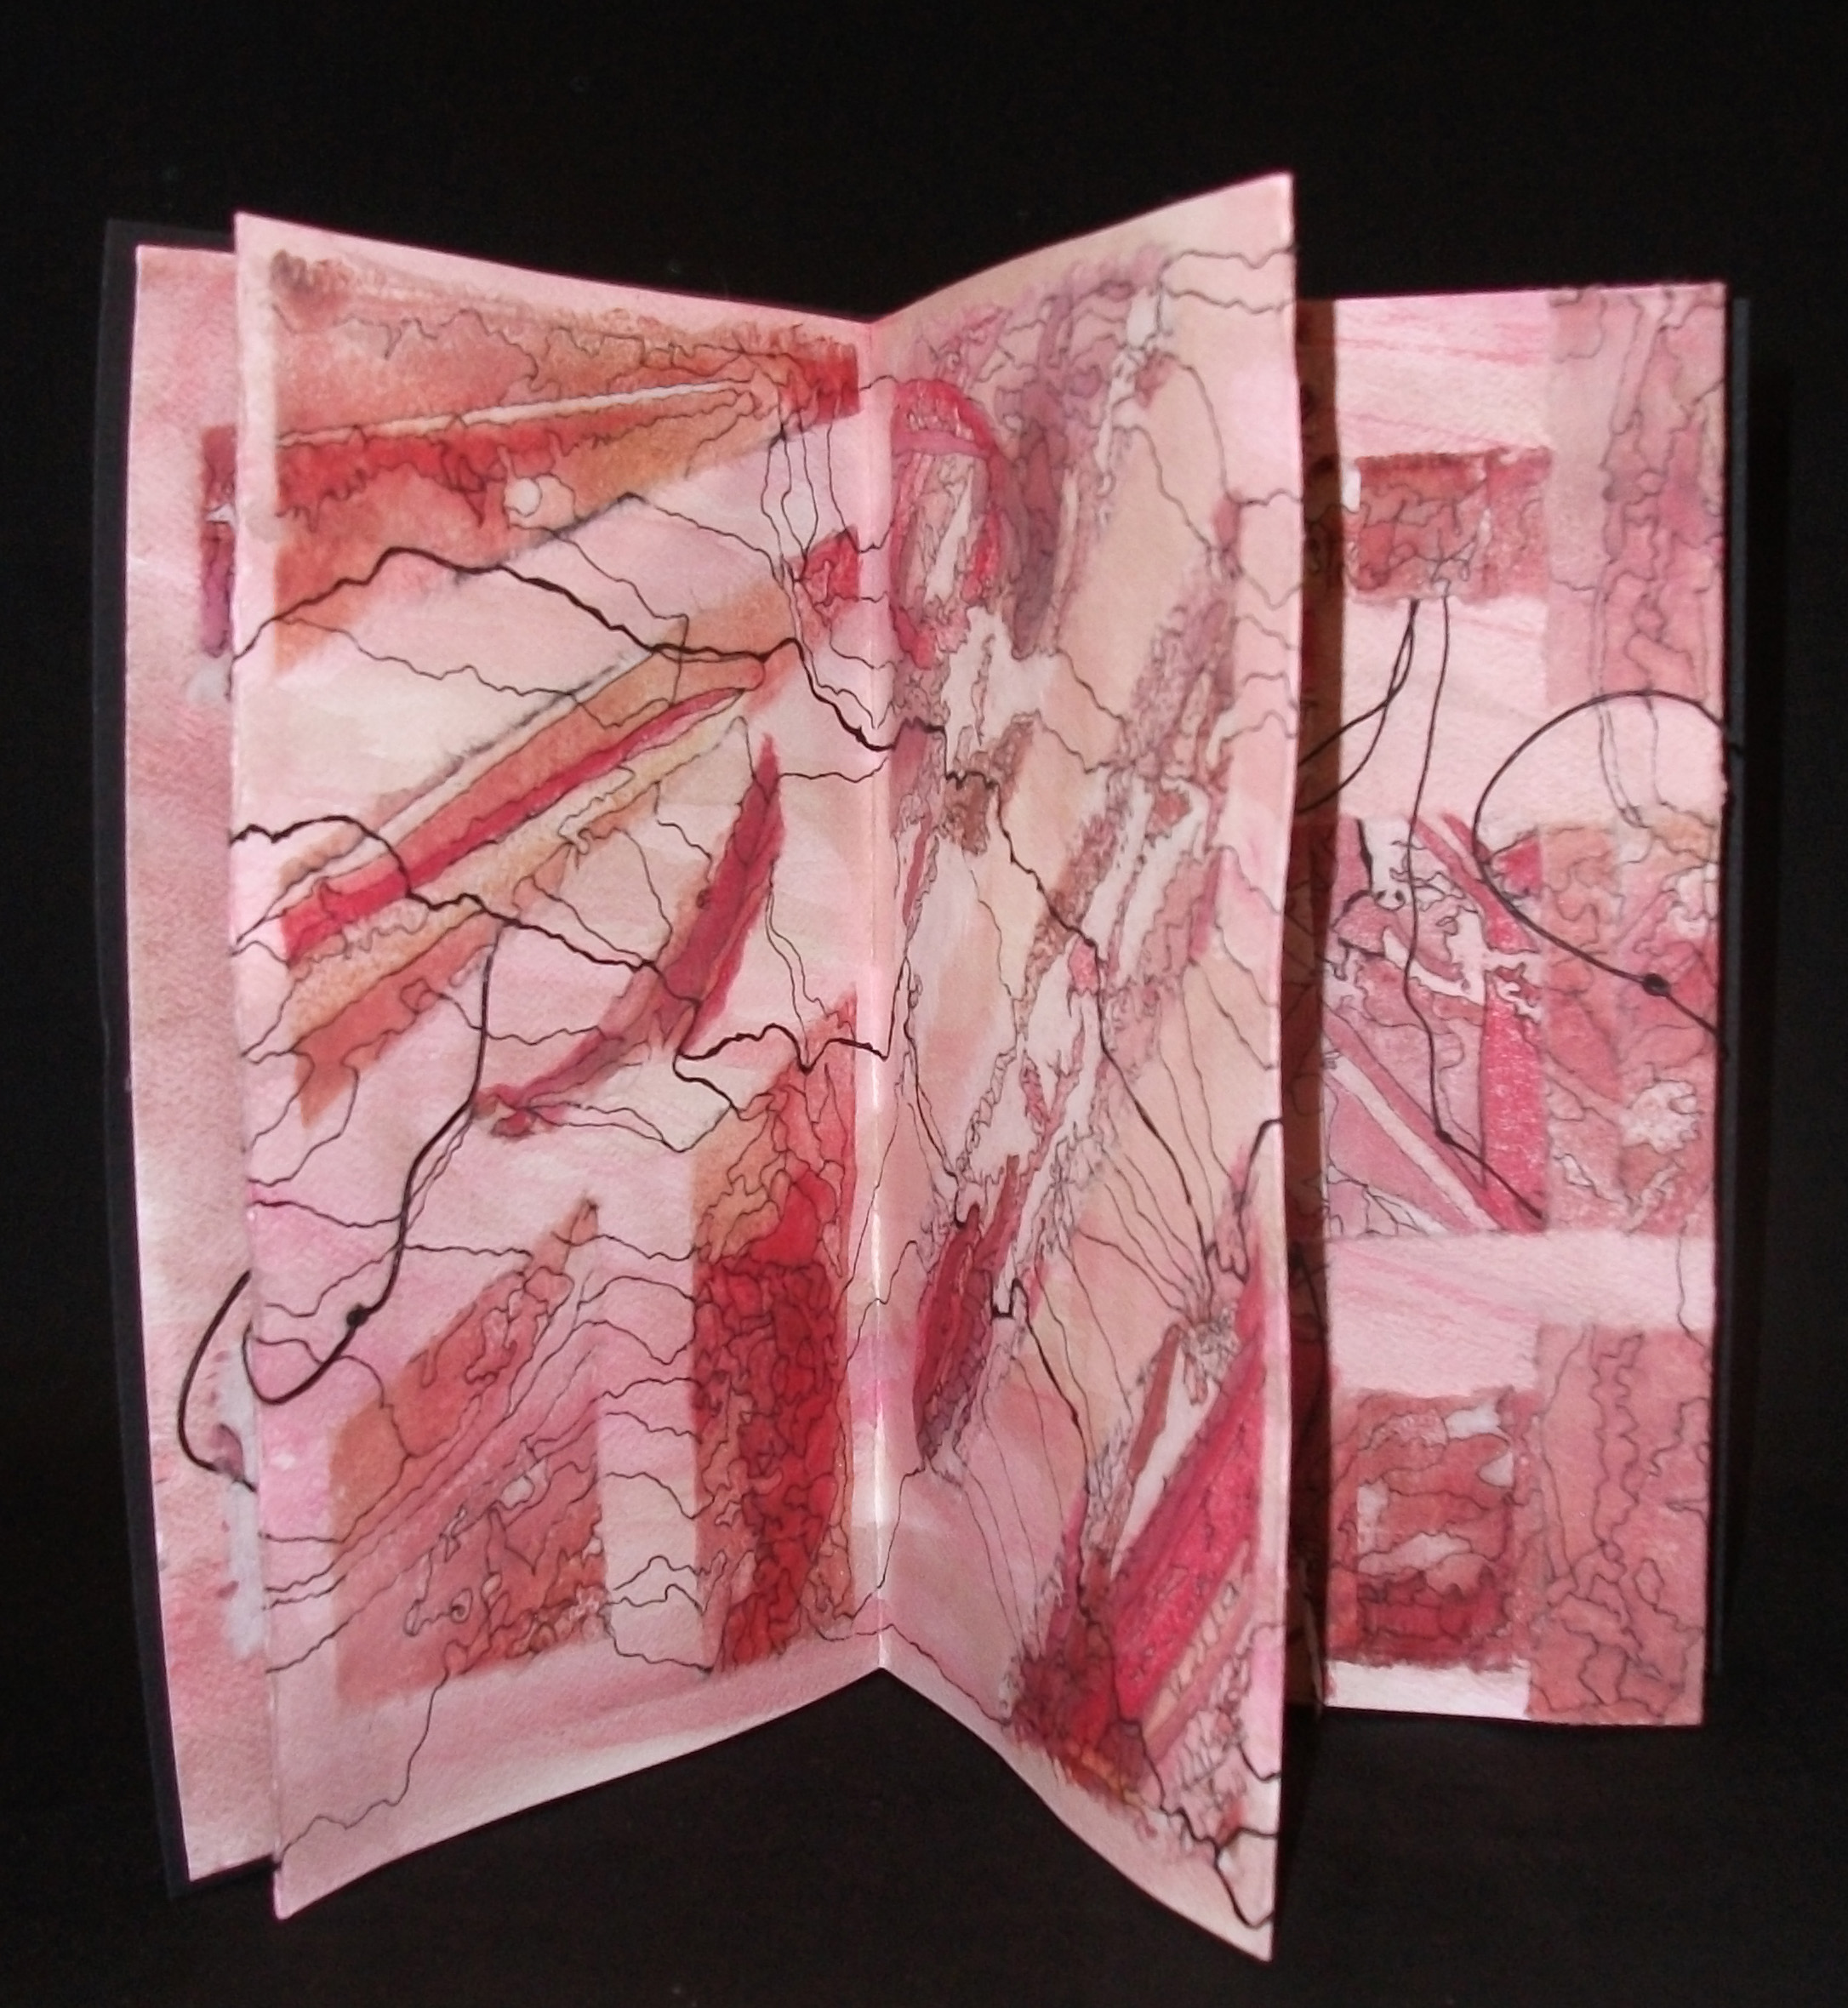 Pathways, Allison Roscoe, Encaustic, Paper, Ink, North Bennington, 2011